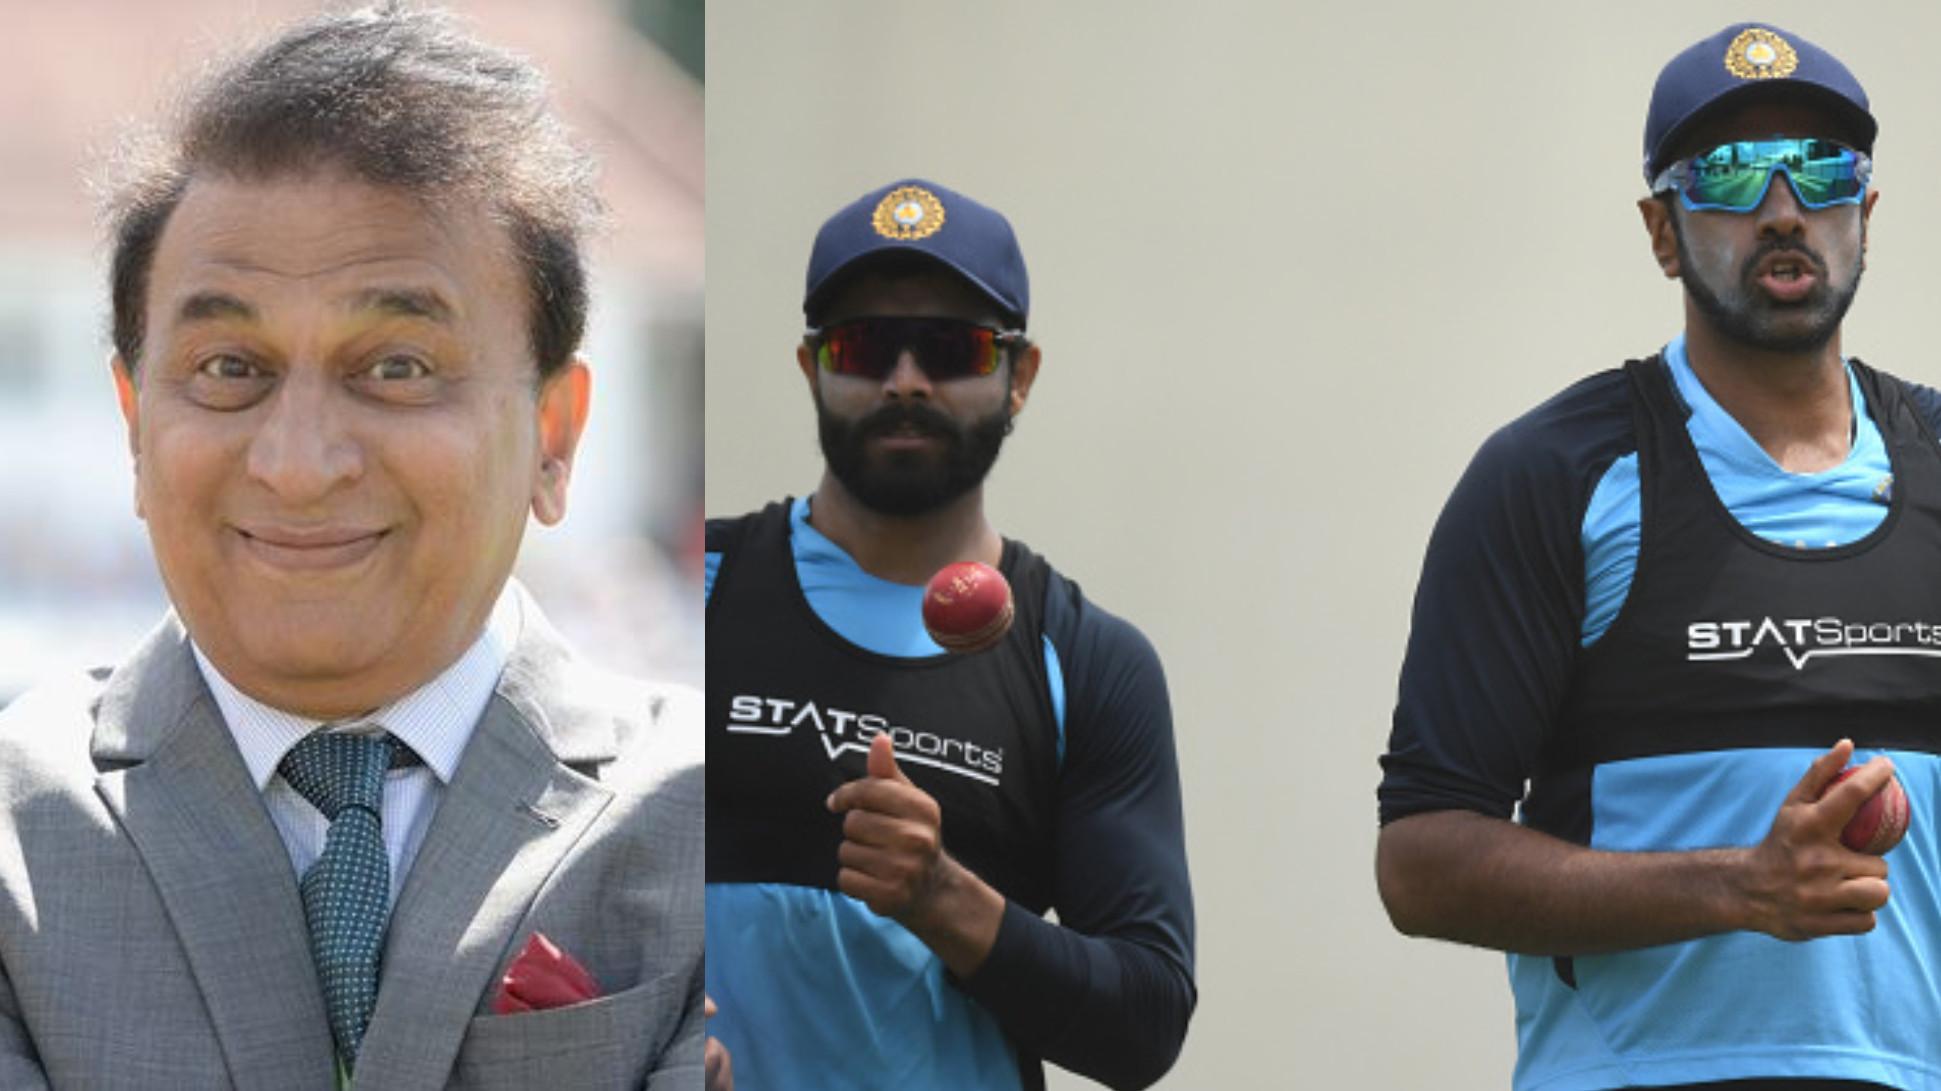 WTC 2021 Final: Sunil Gavaskar expects both Jadeja and Ashwin to play in 'boiling hot' Southampton